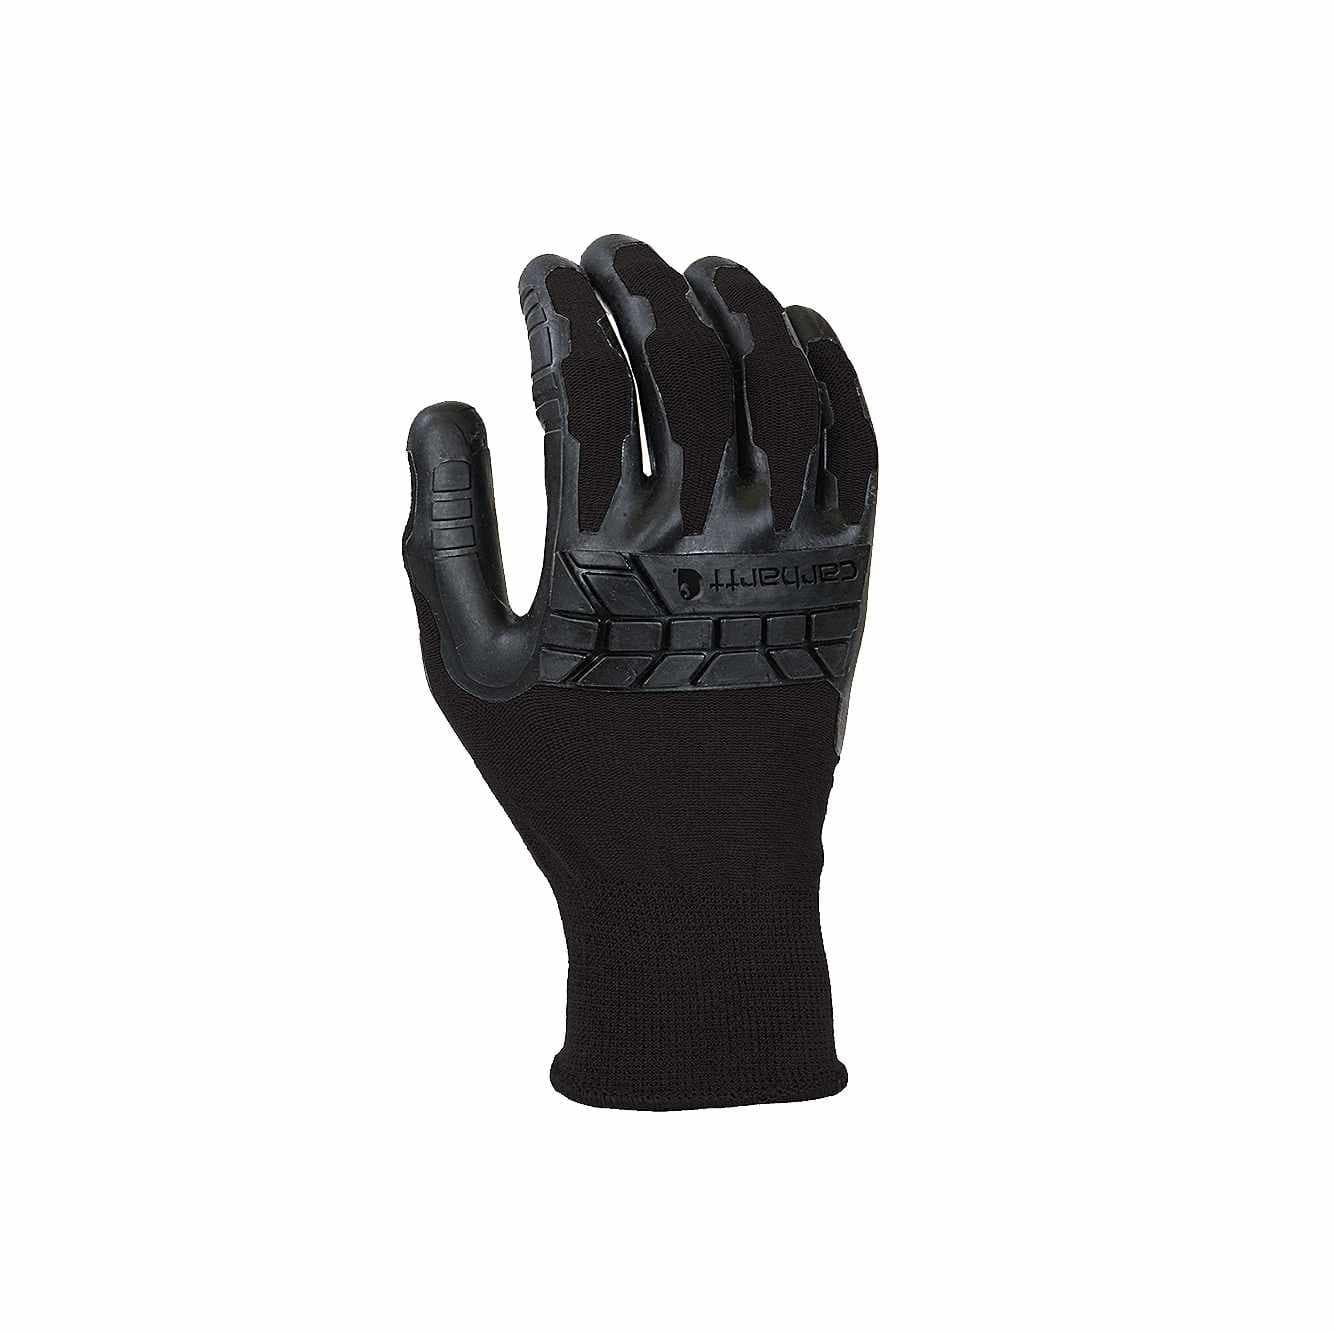 Picture of Knuckler C-Grip® Glove in Black